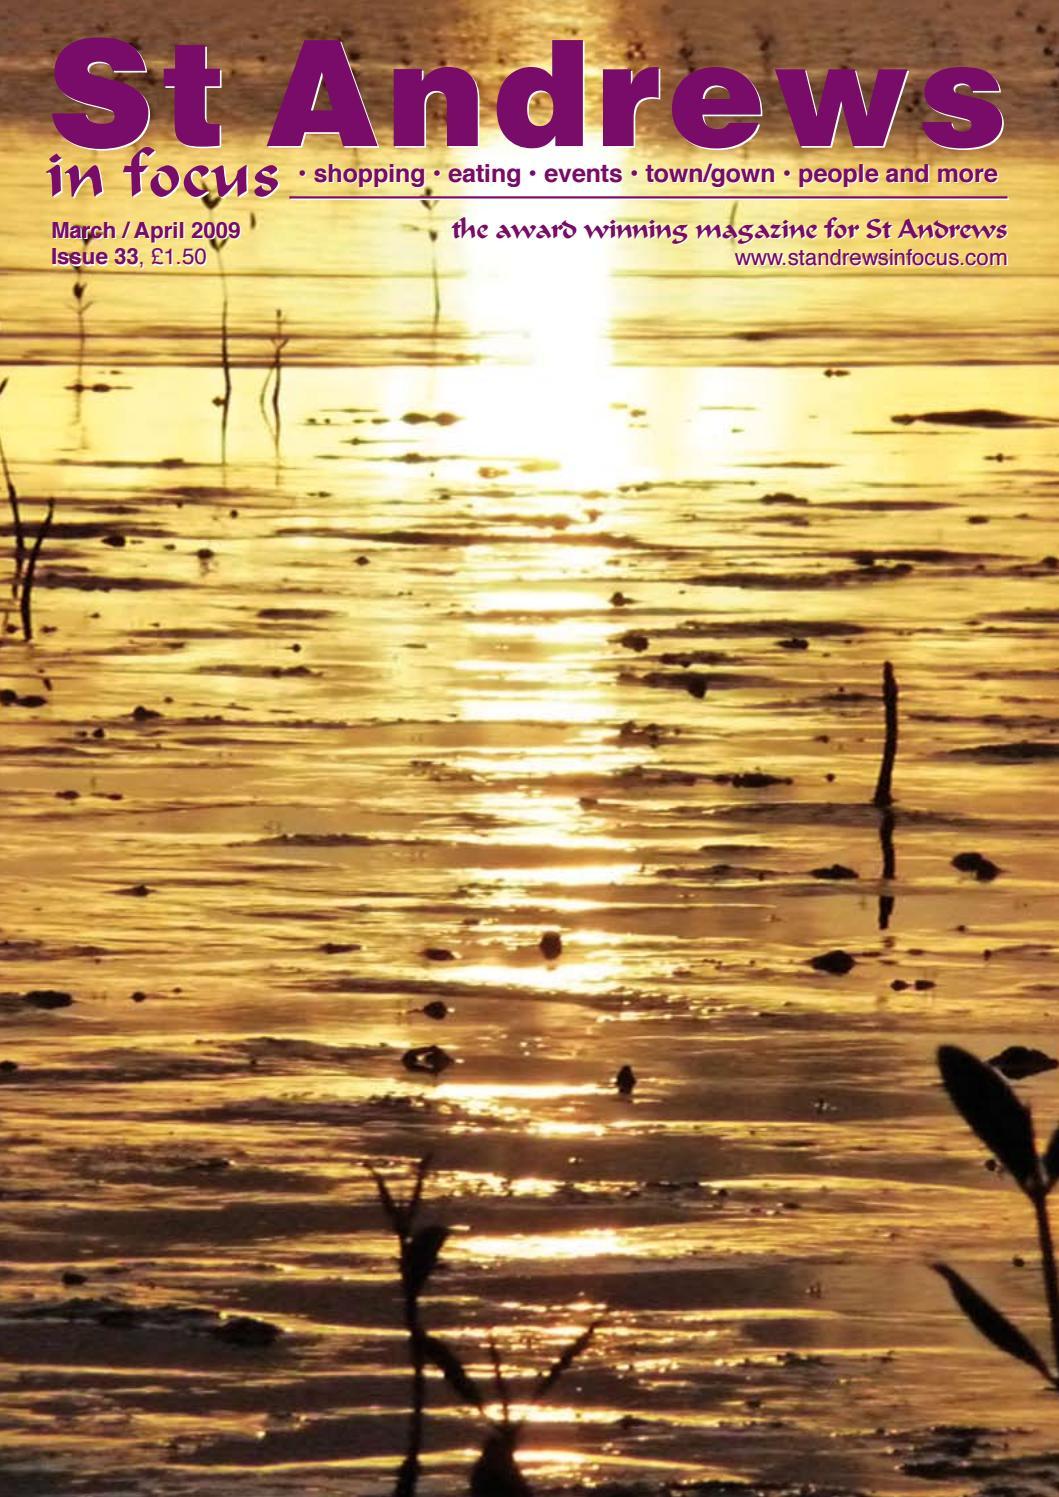 St Andrews in Focus Issue 33 Mar Apr 2009